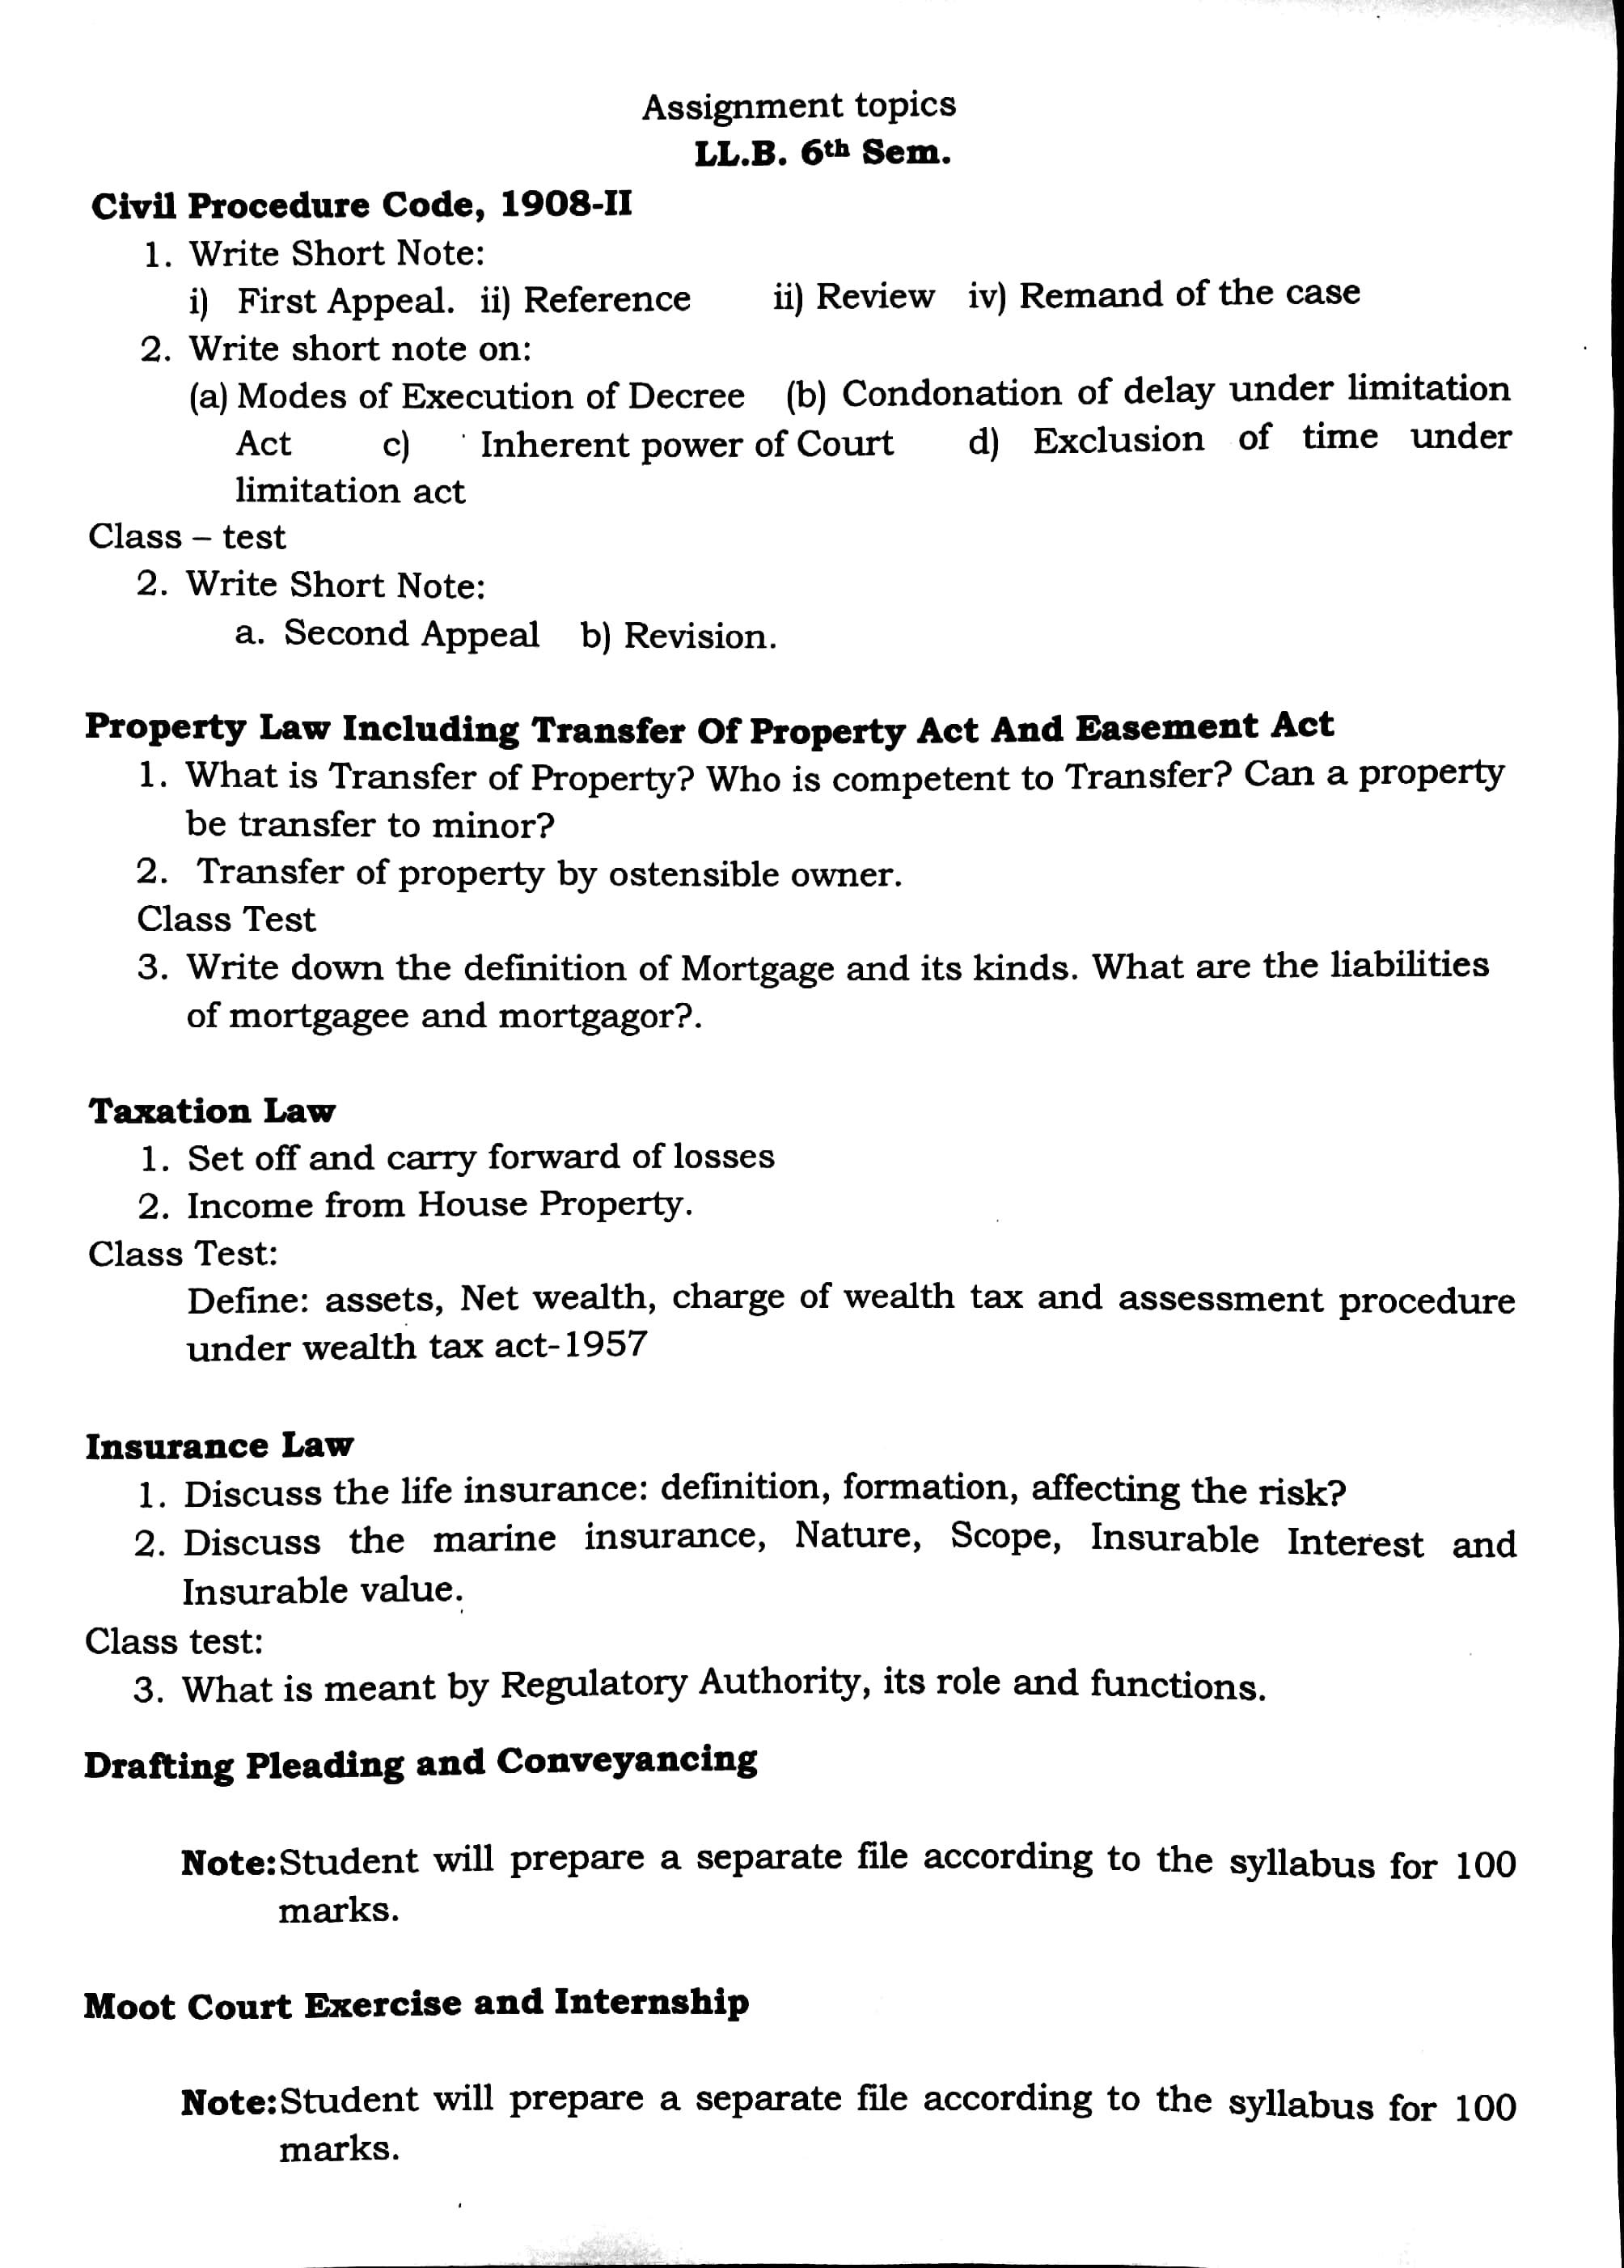 Public islamic bank berhad annual report 2007